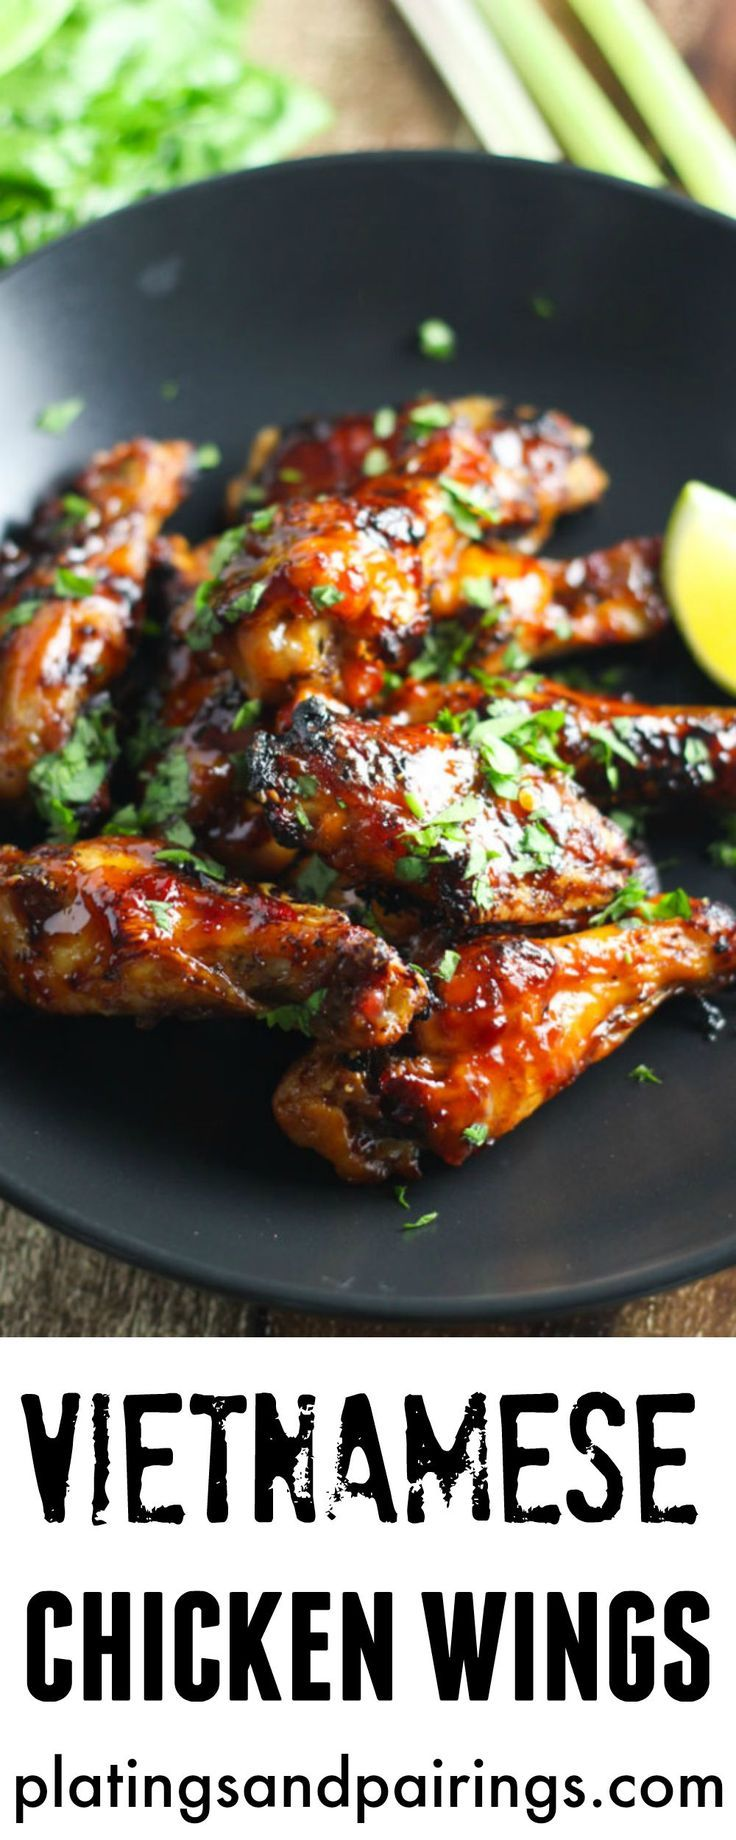 Vietnamese Chicken Wings - Baked, not fried and full of flavor! platingsandpairings.com